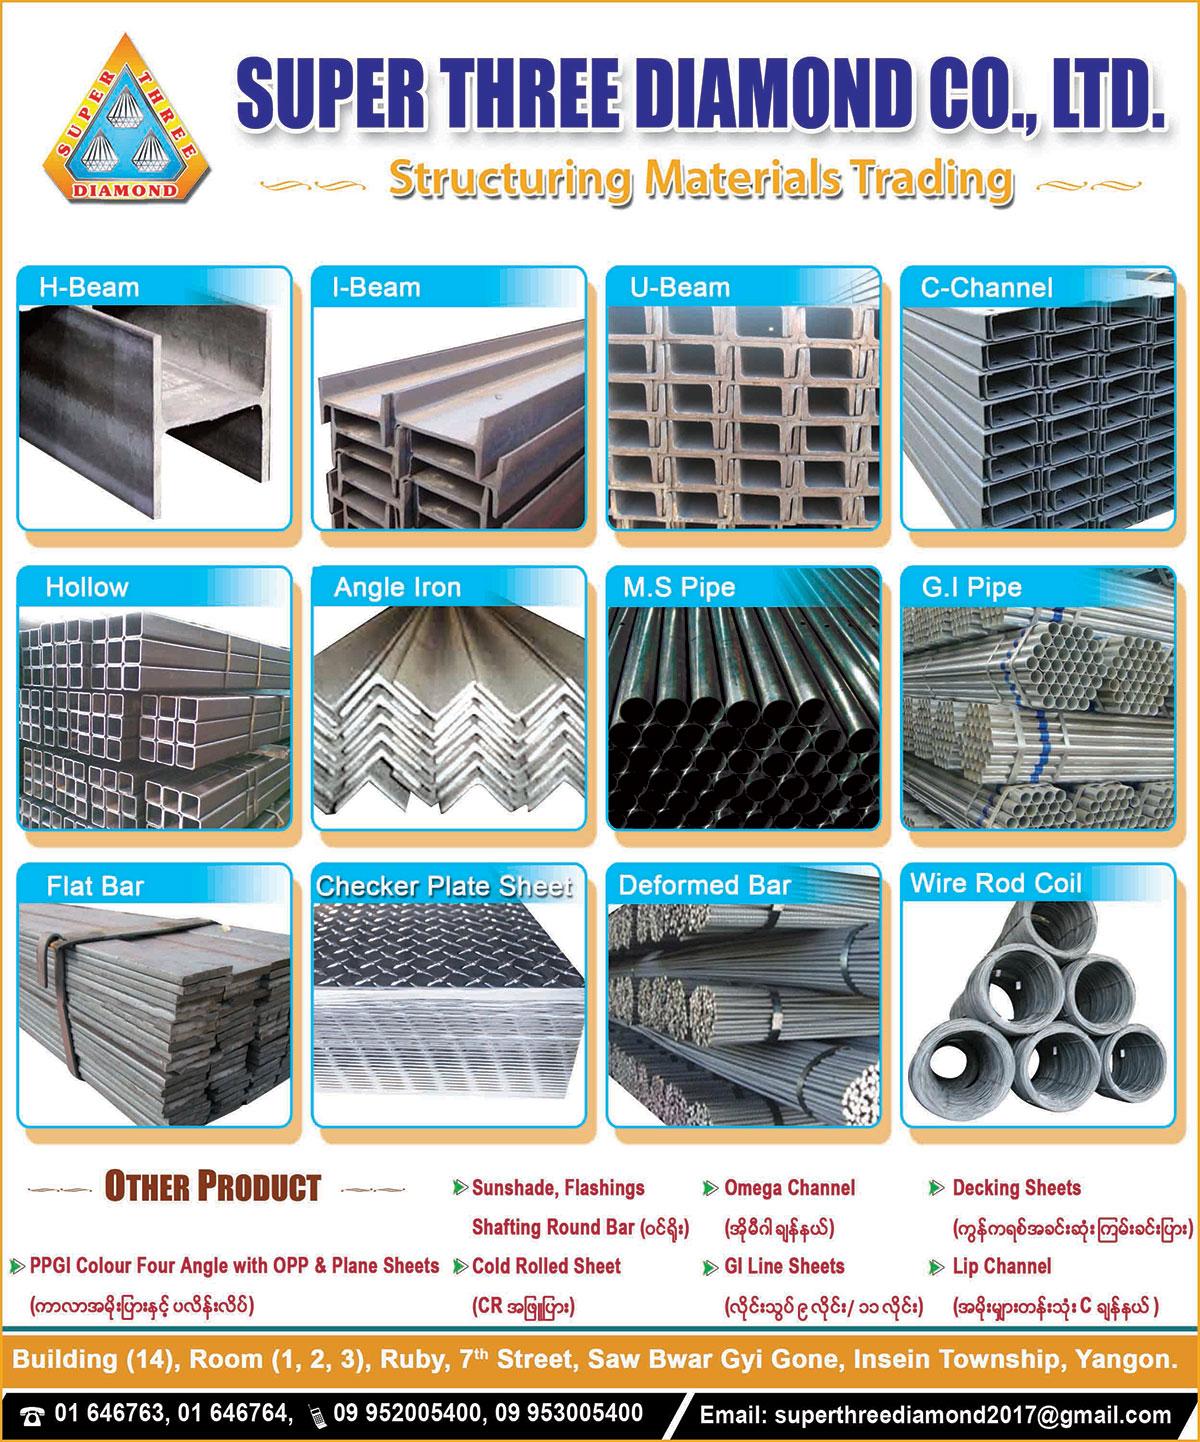 Super Three Diamond Co., Ltd.Hardware Merchants & Ironmongers